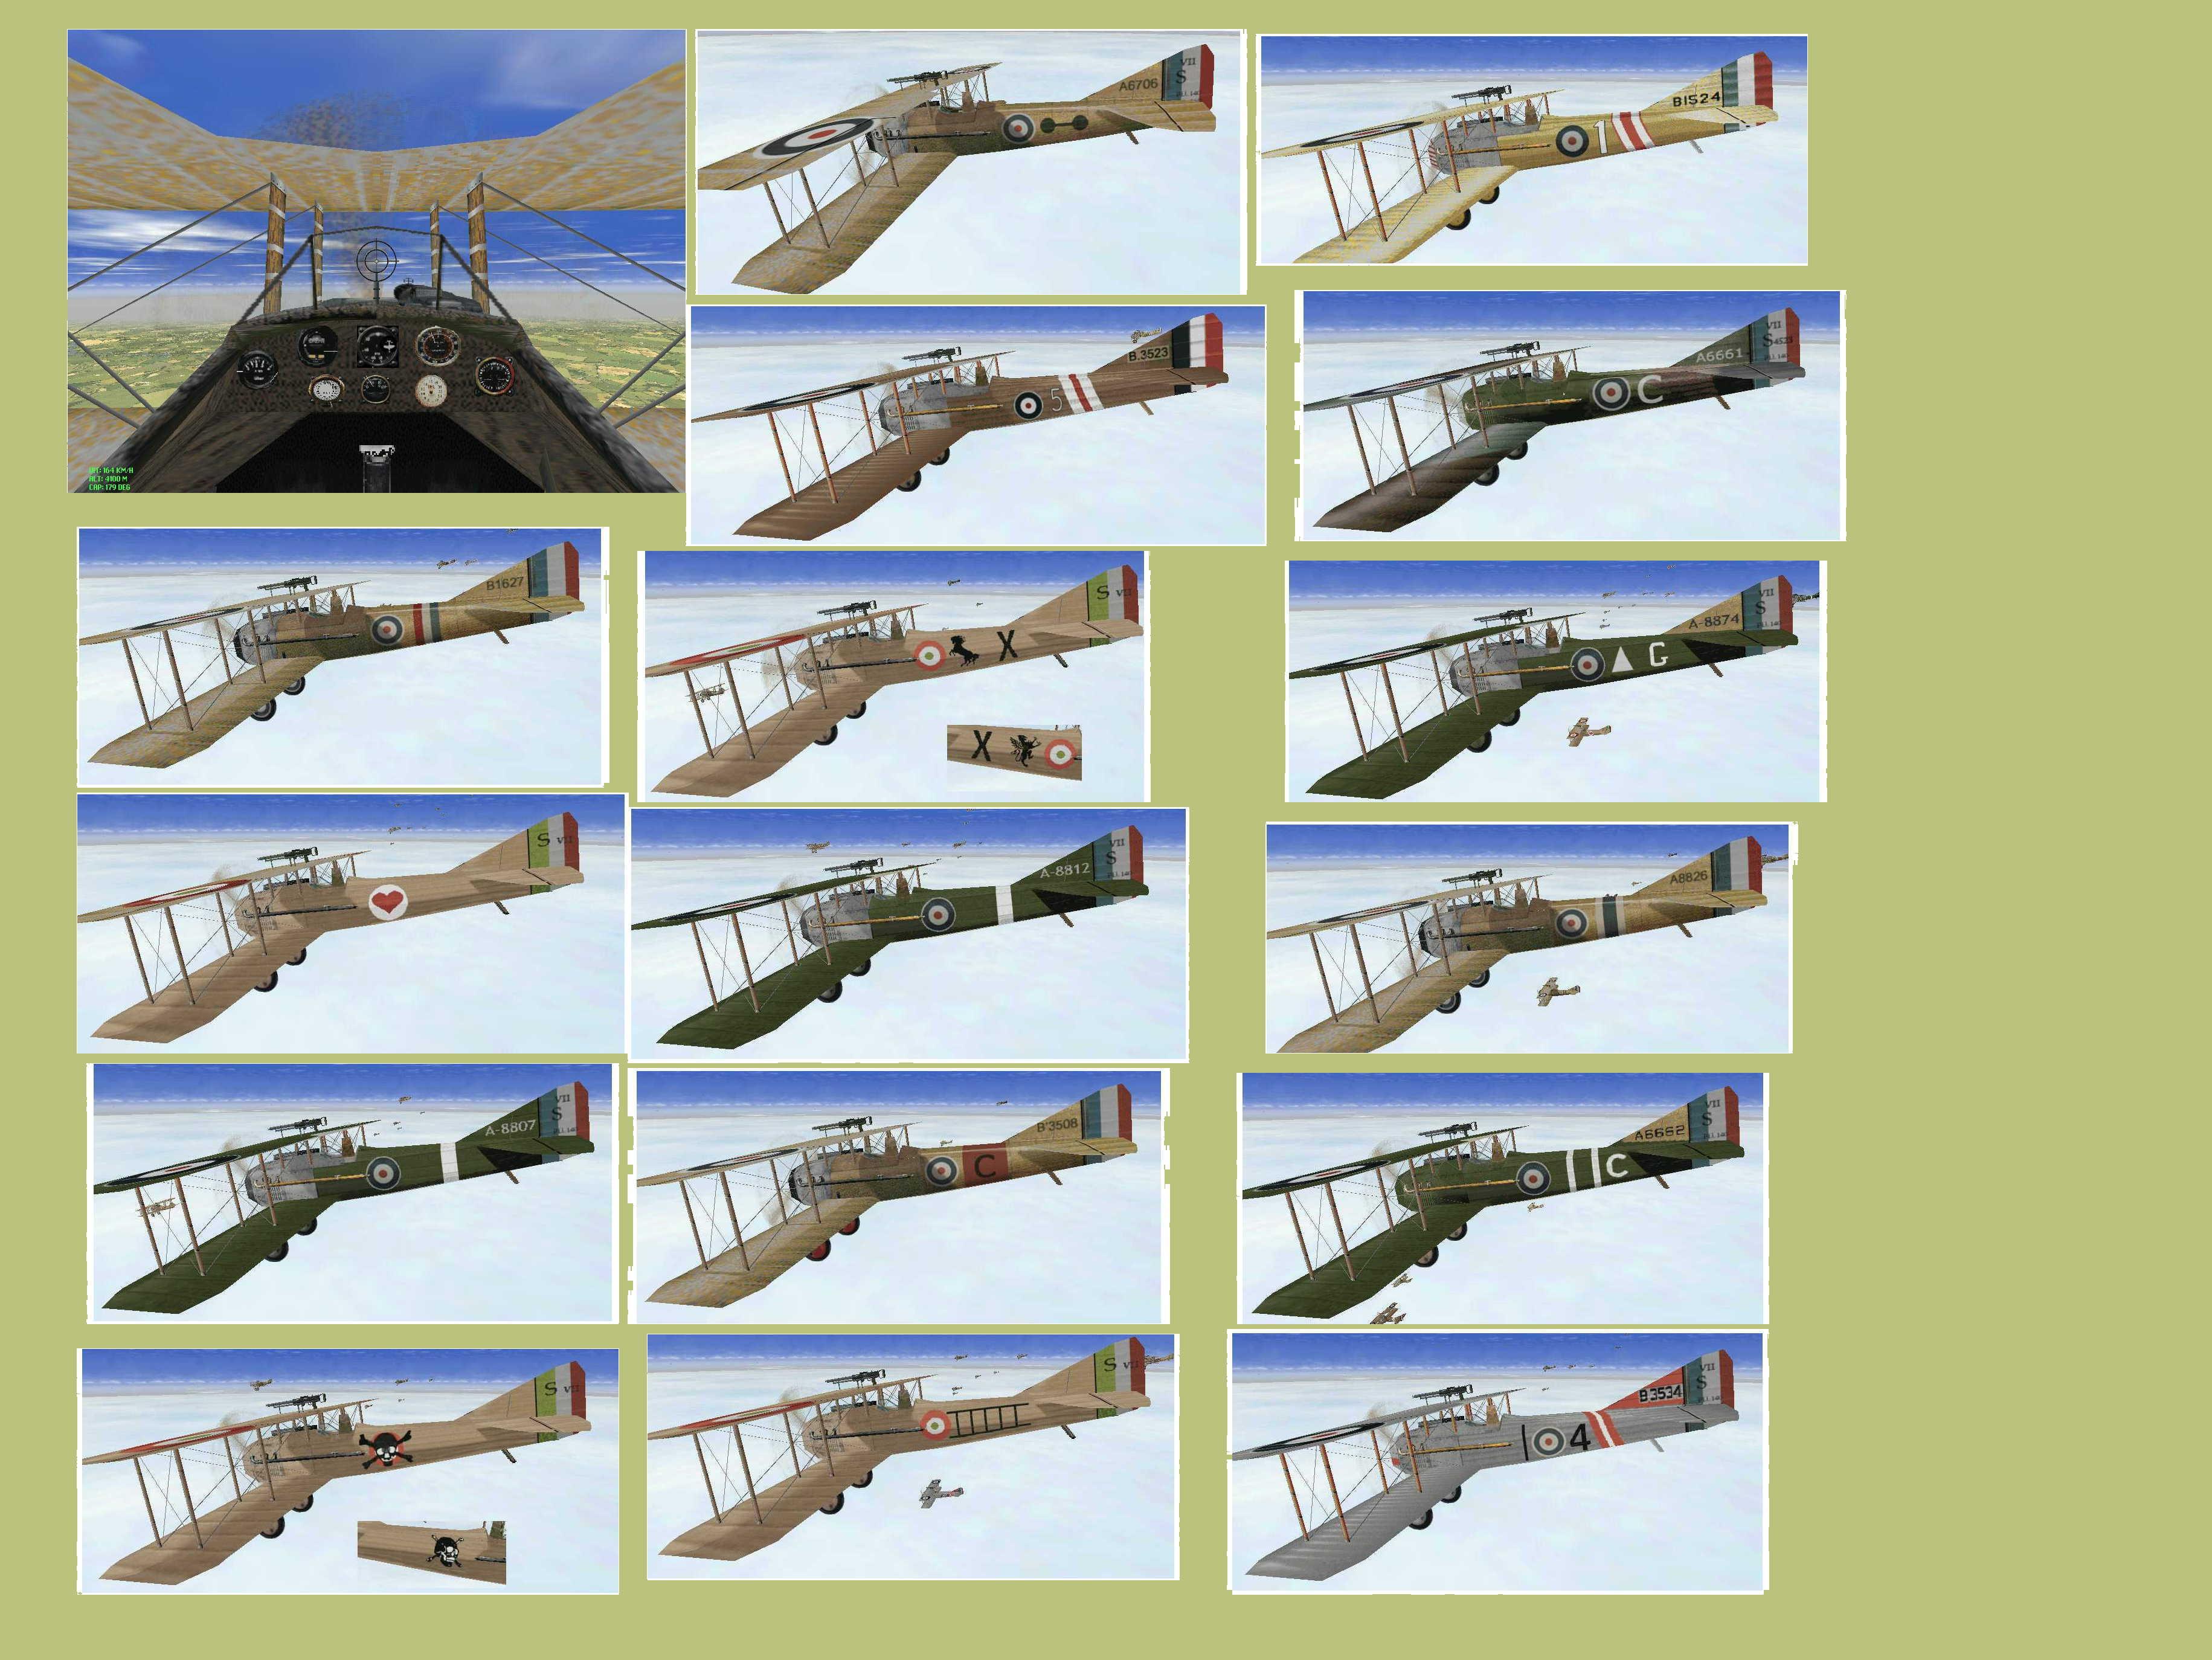 140Trial planes skin